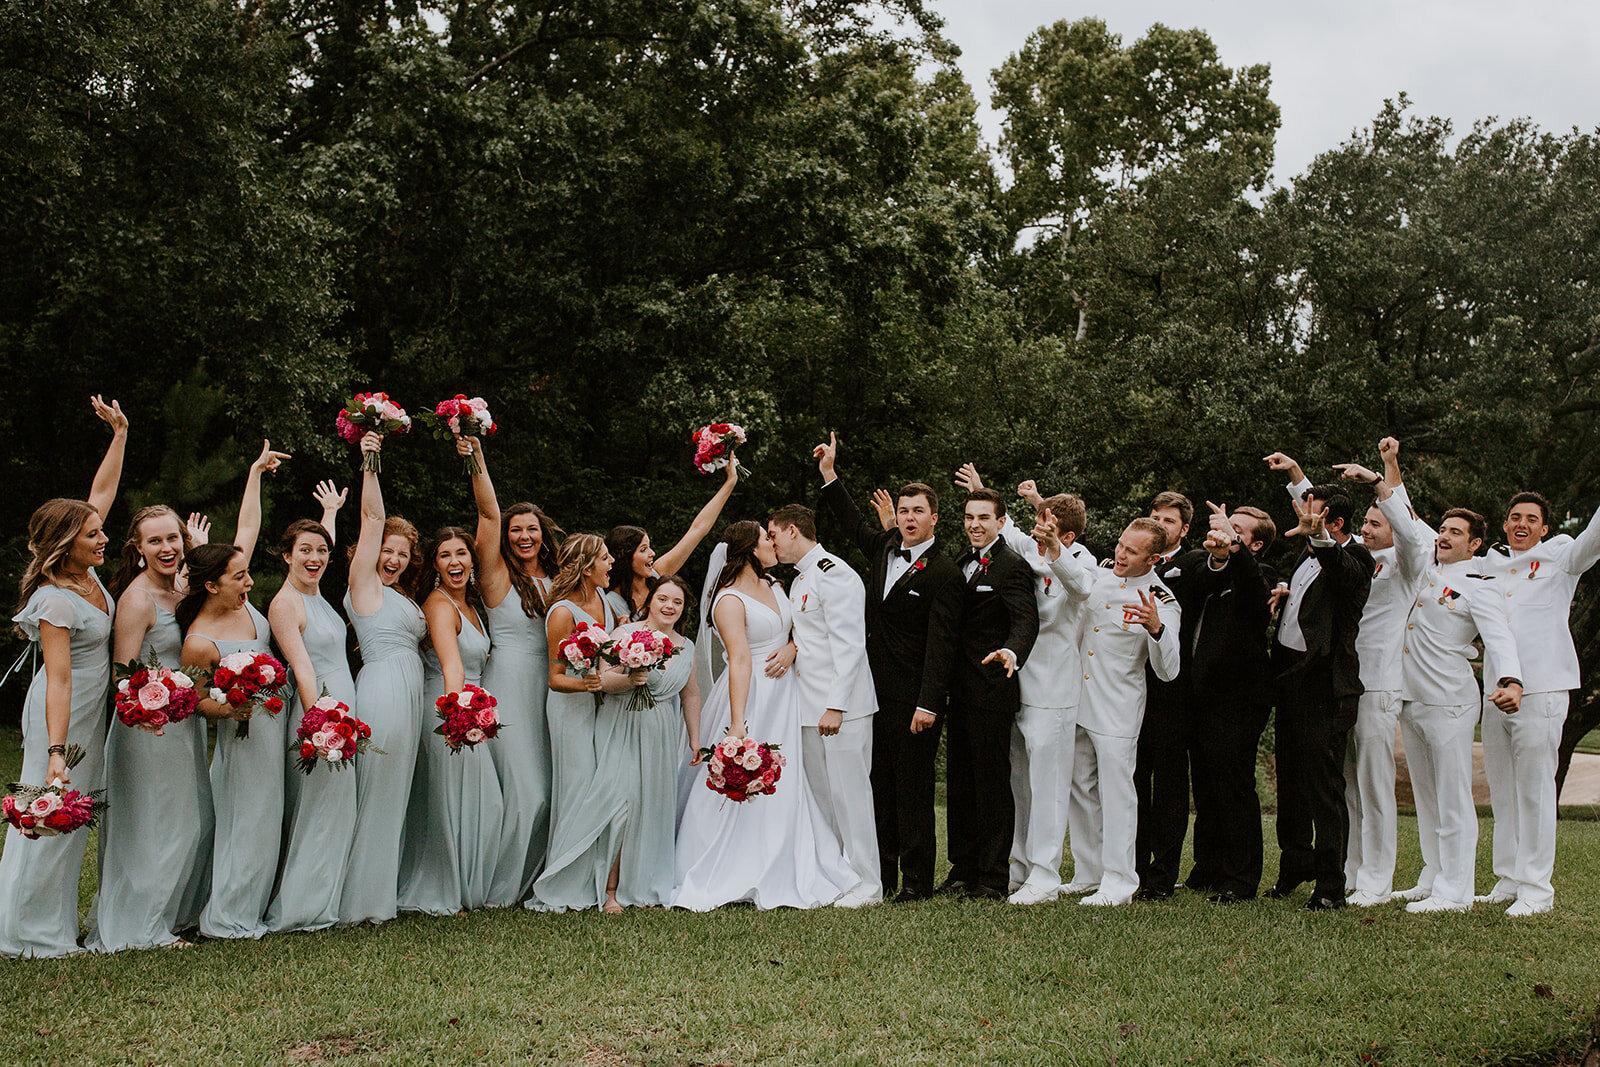 tori-matthews-photography-houston-texas-wedding-photographer-2-729.jpg